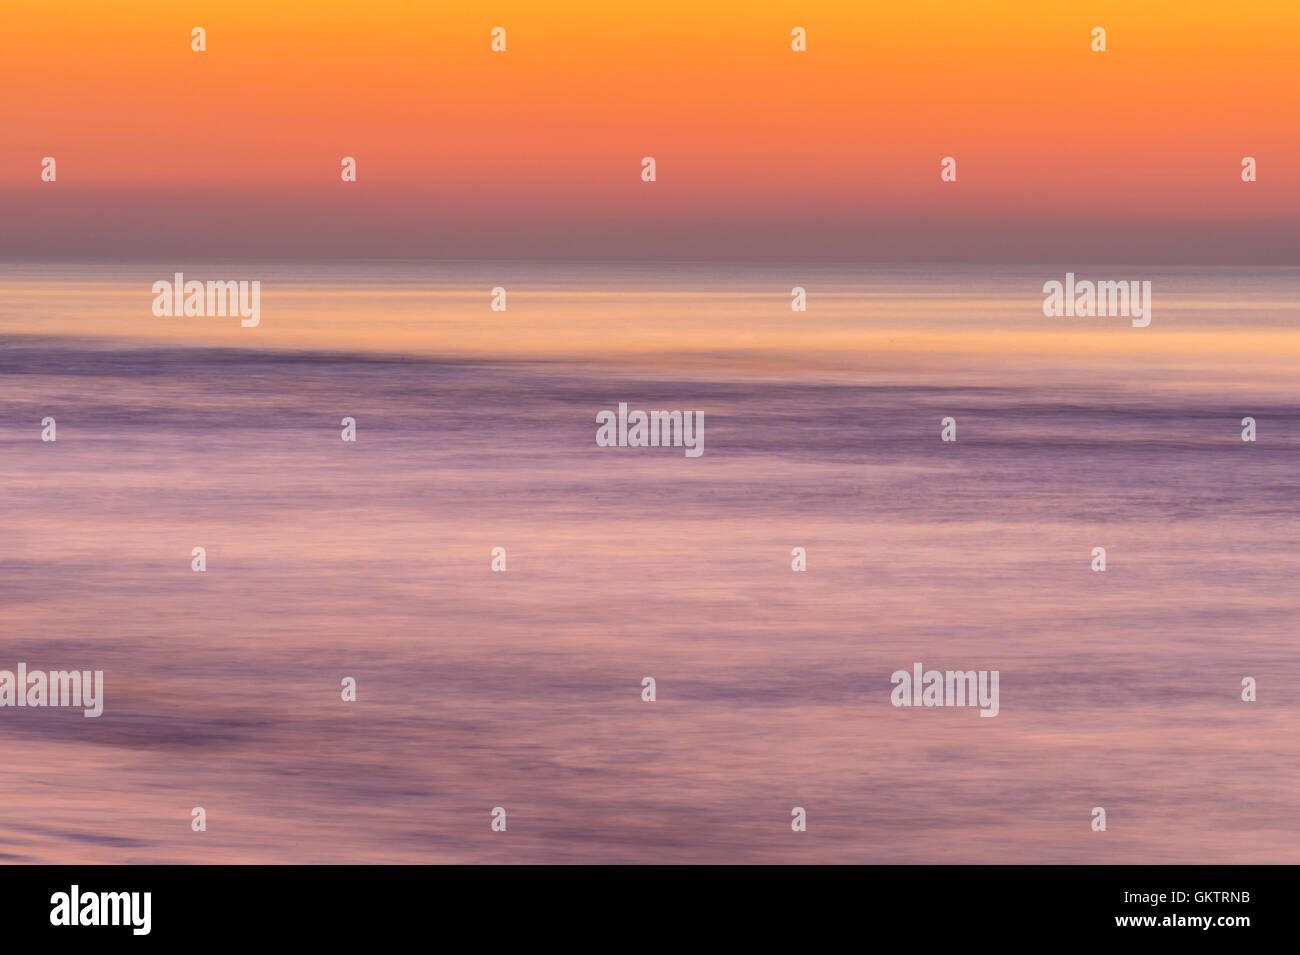 Artistic Sunrise Ocean Blur - Stock Image